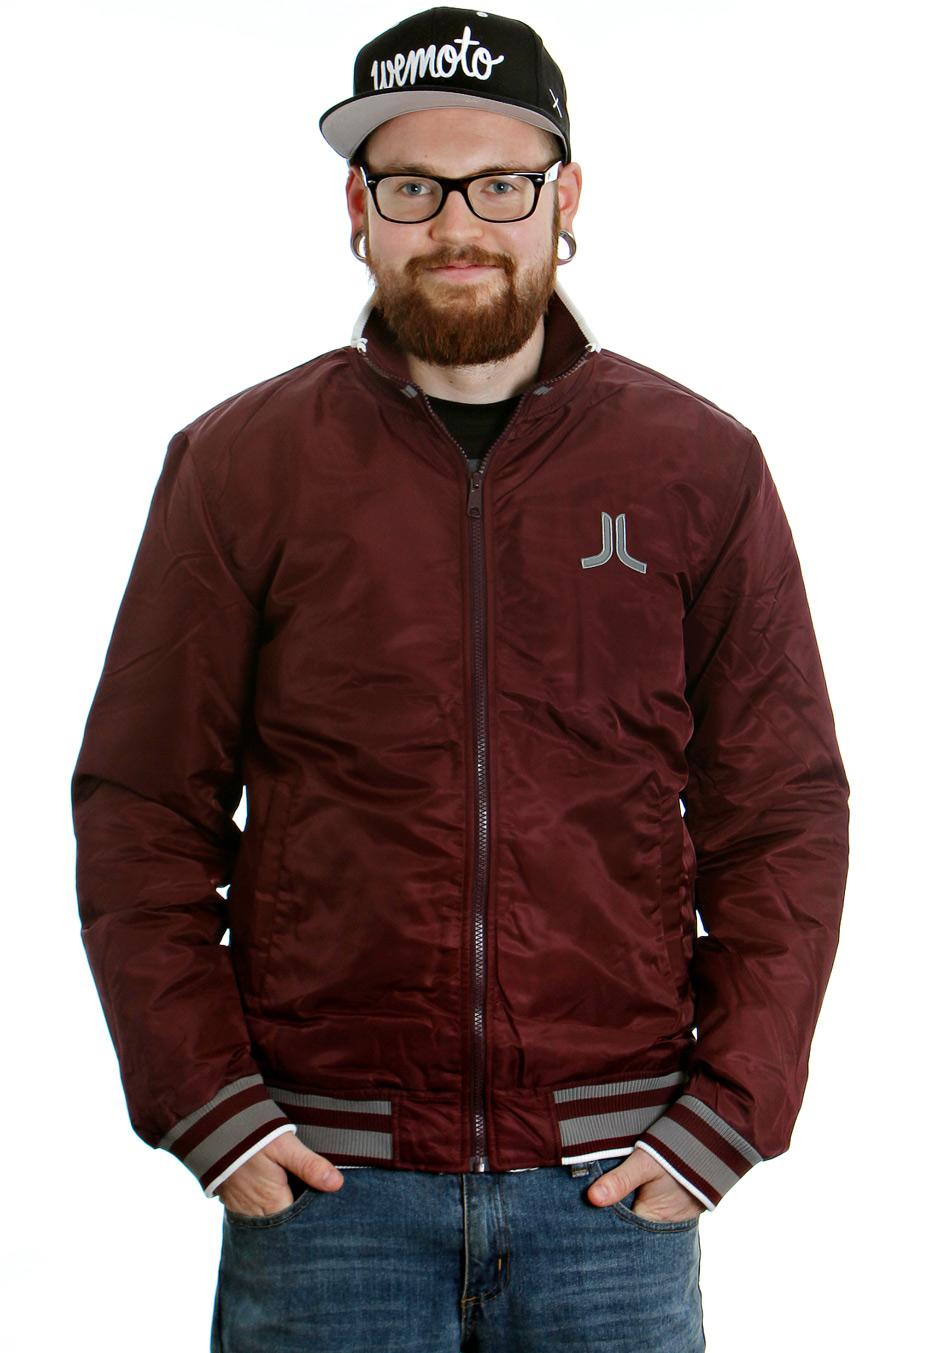 e79e73d67ffb9 Wesc - Wille Red Port - College Jacket - Streetwear Shop - Impericon.com AU